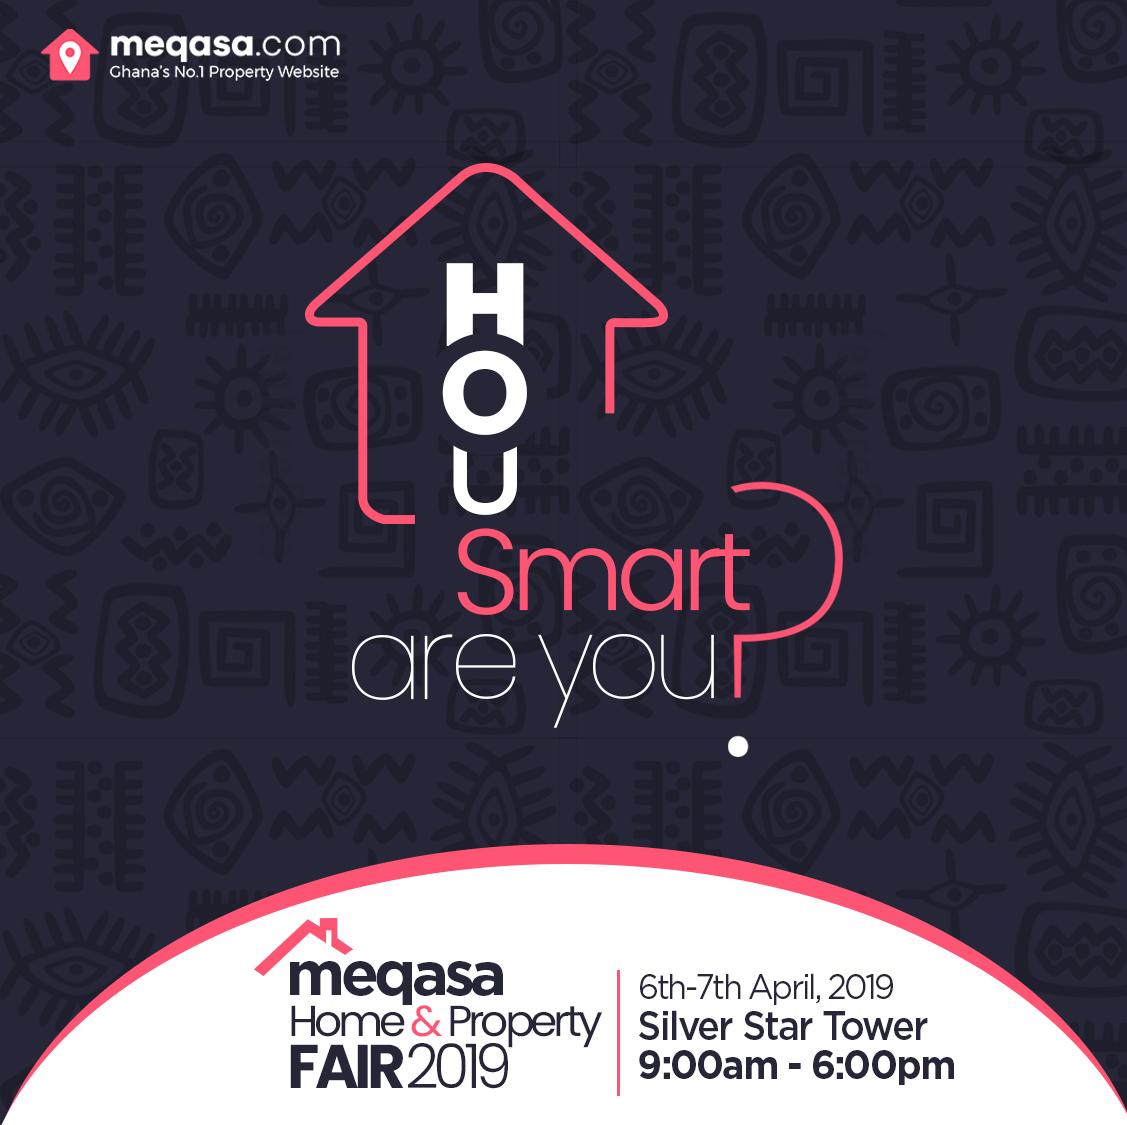 meqasa home and property fair 2019 house smart are you